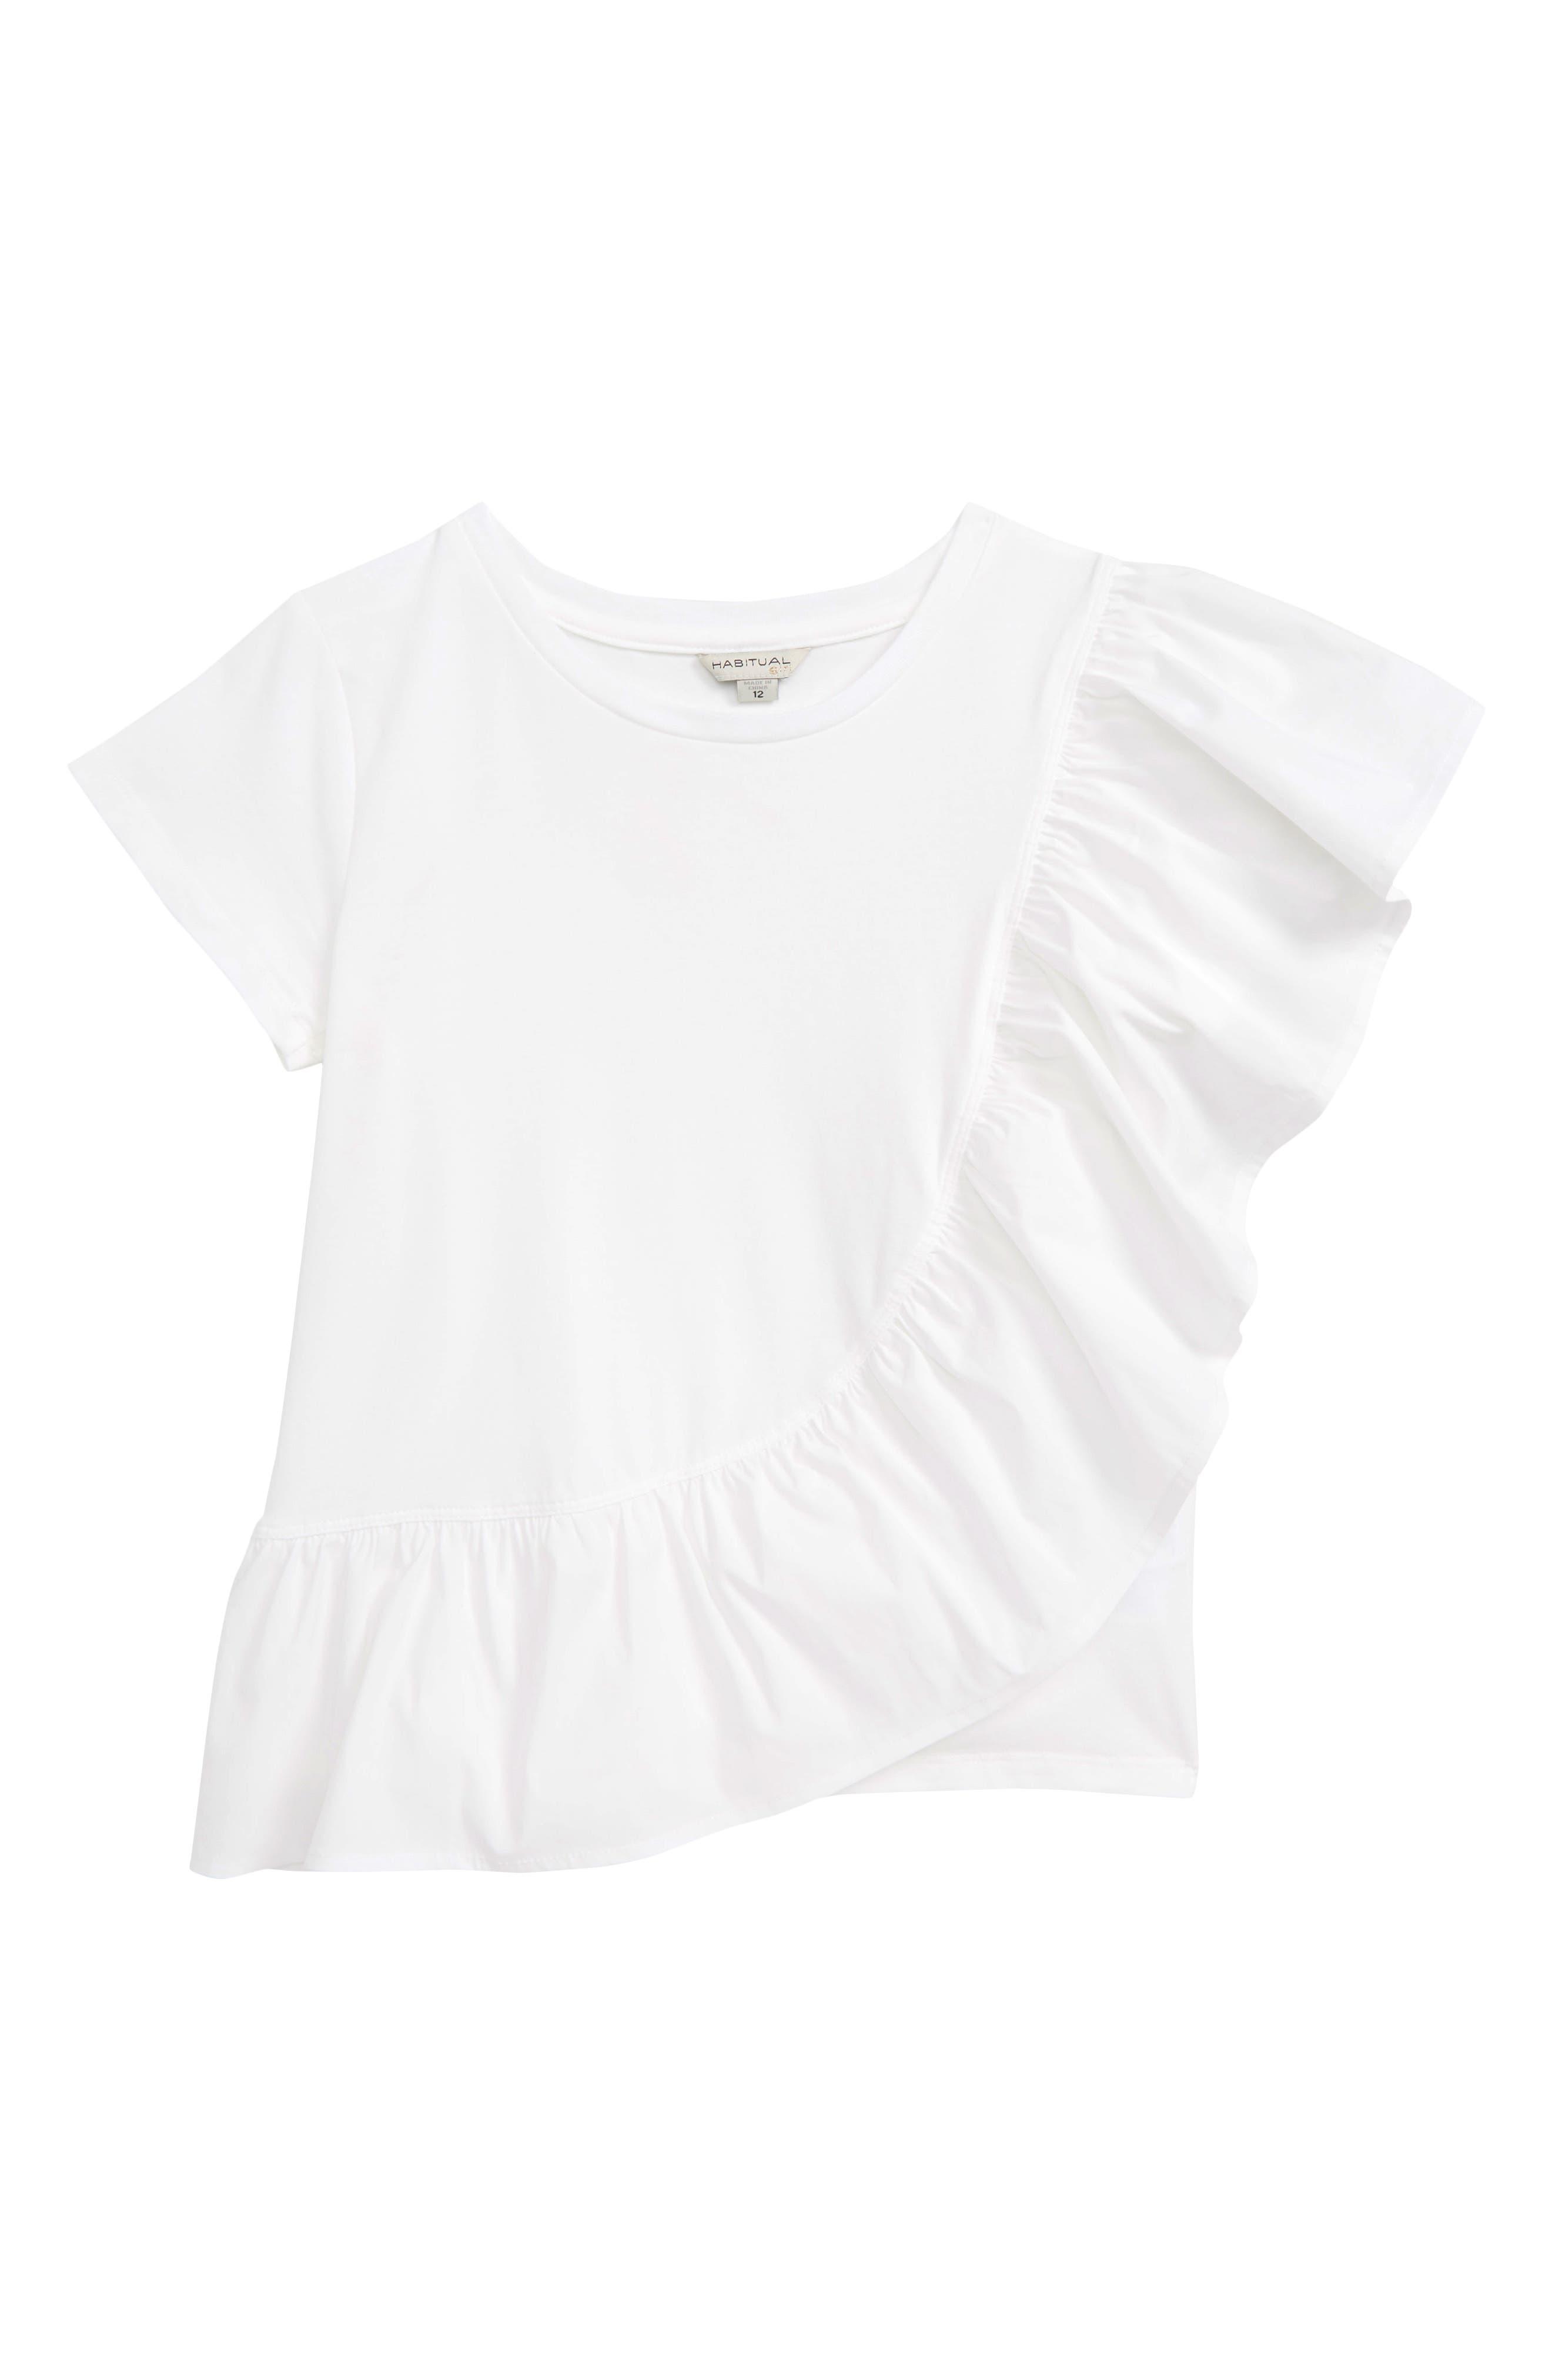 HABITUAL GIRL, Cilla Asymmetrical Ruffle Top, Main thumbnail 1, color, WHITE